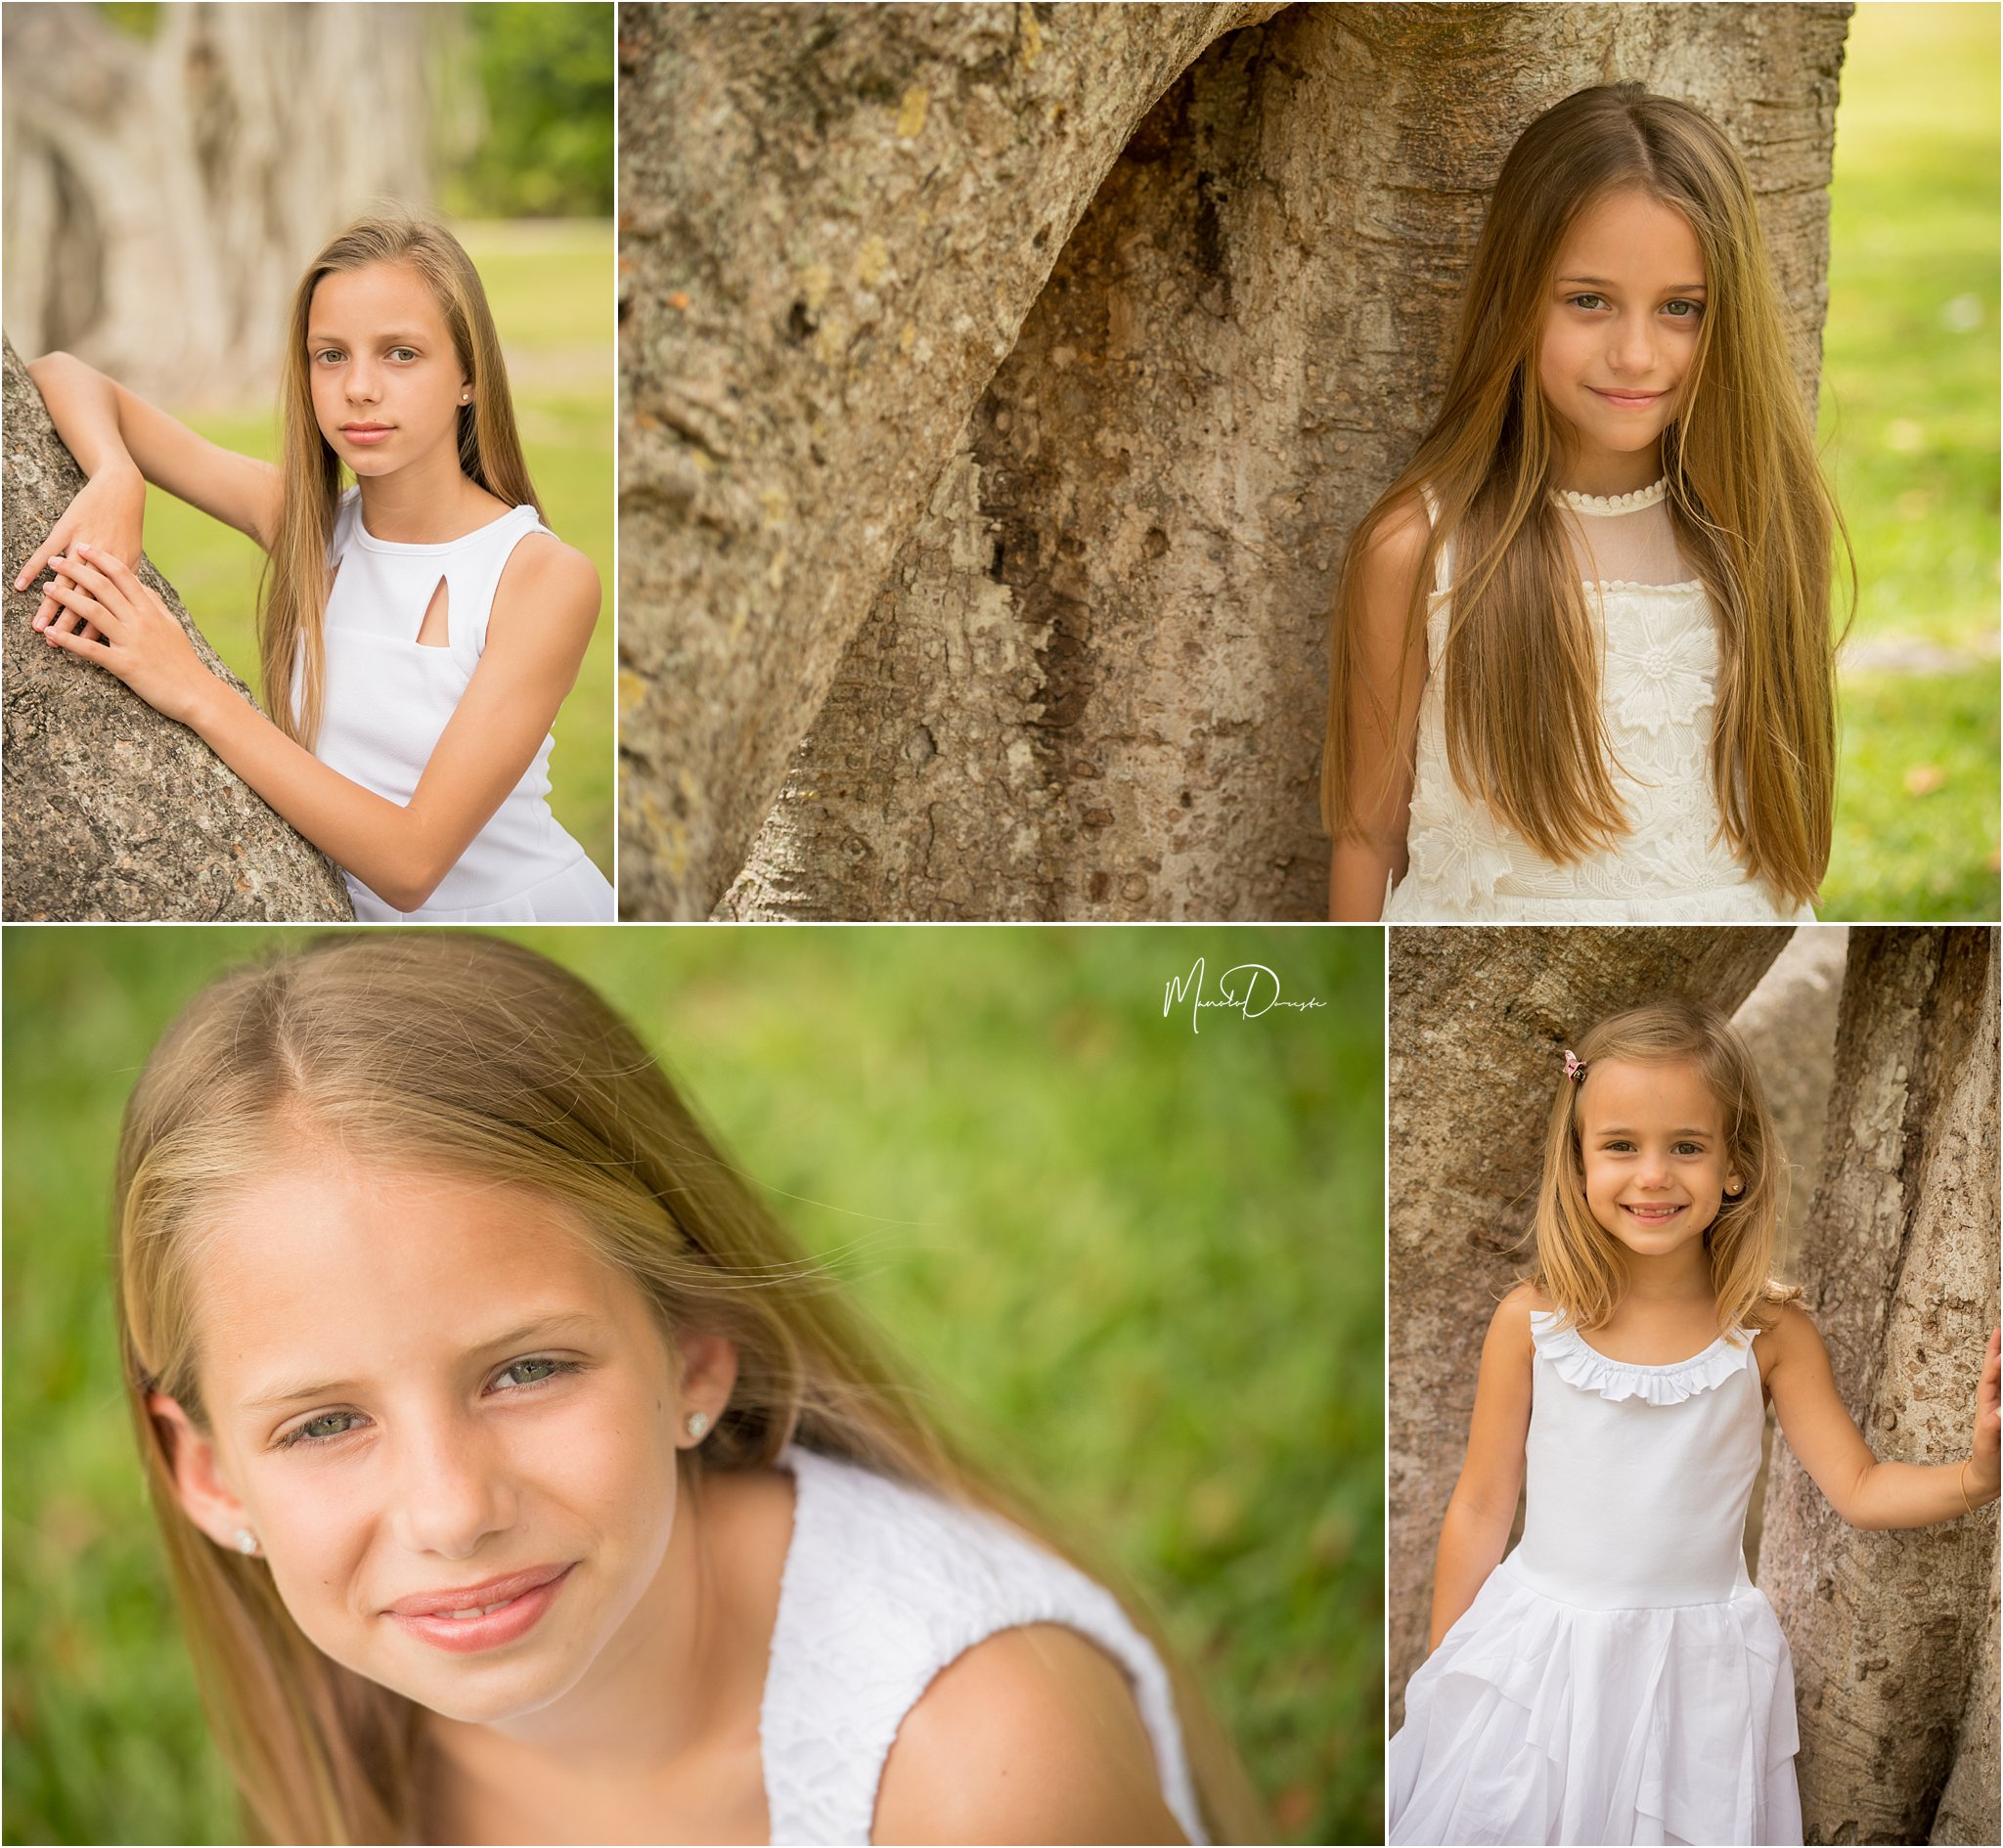 0562_ManoloDoreste_InFocusStudios_Wedding_Family_Photography_Miami_MiamiPhotographer.jpg